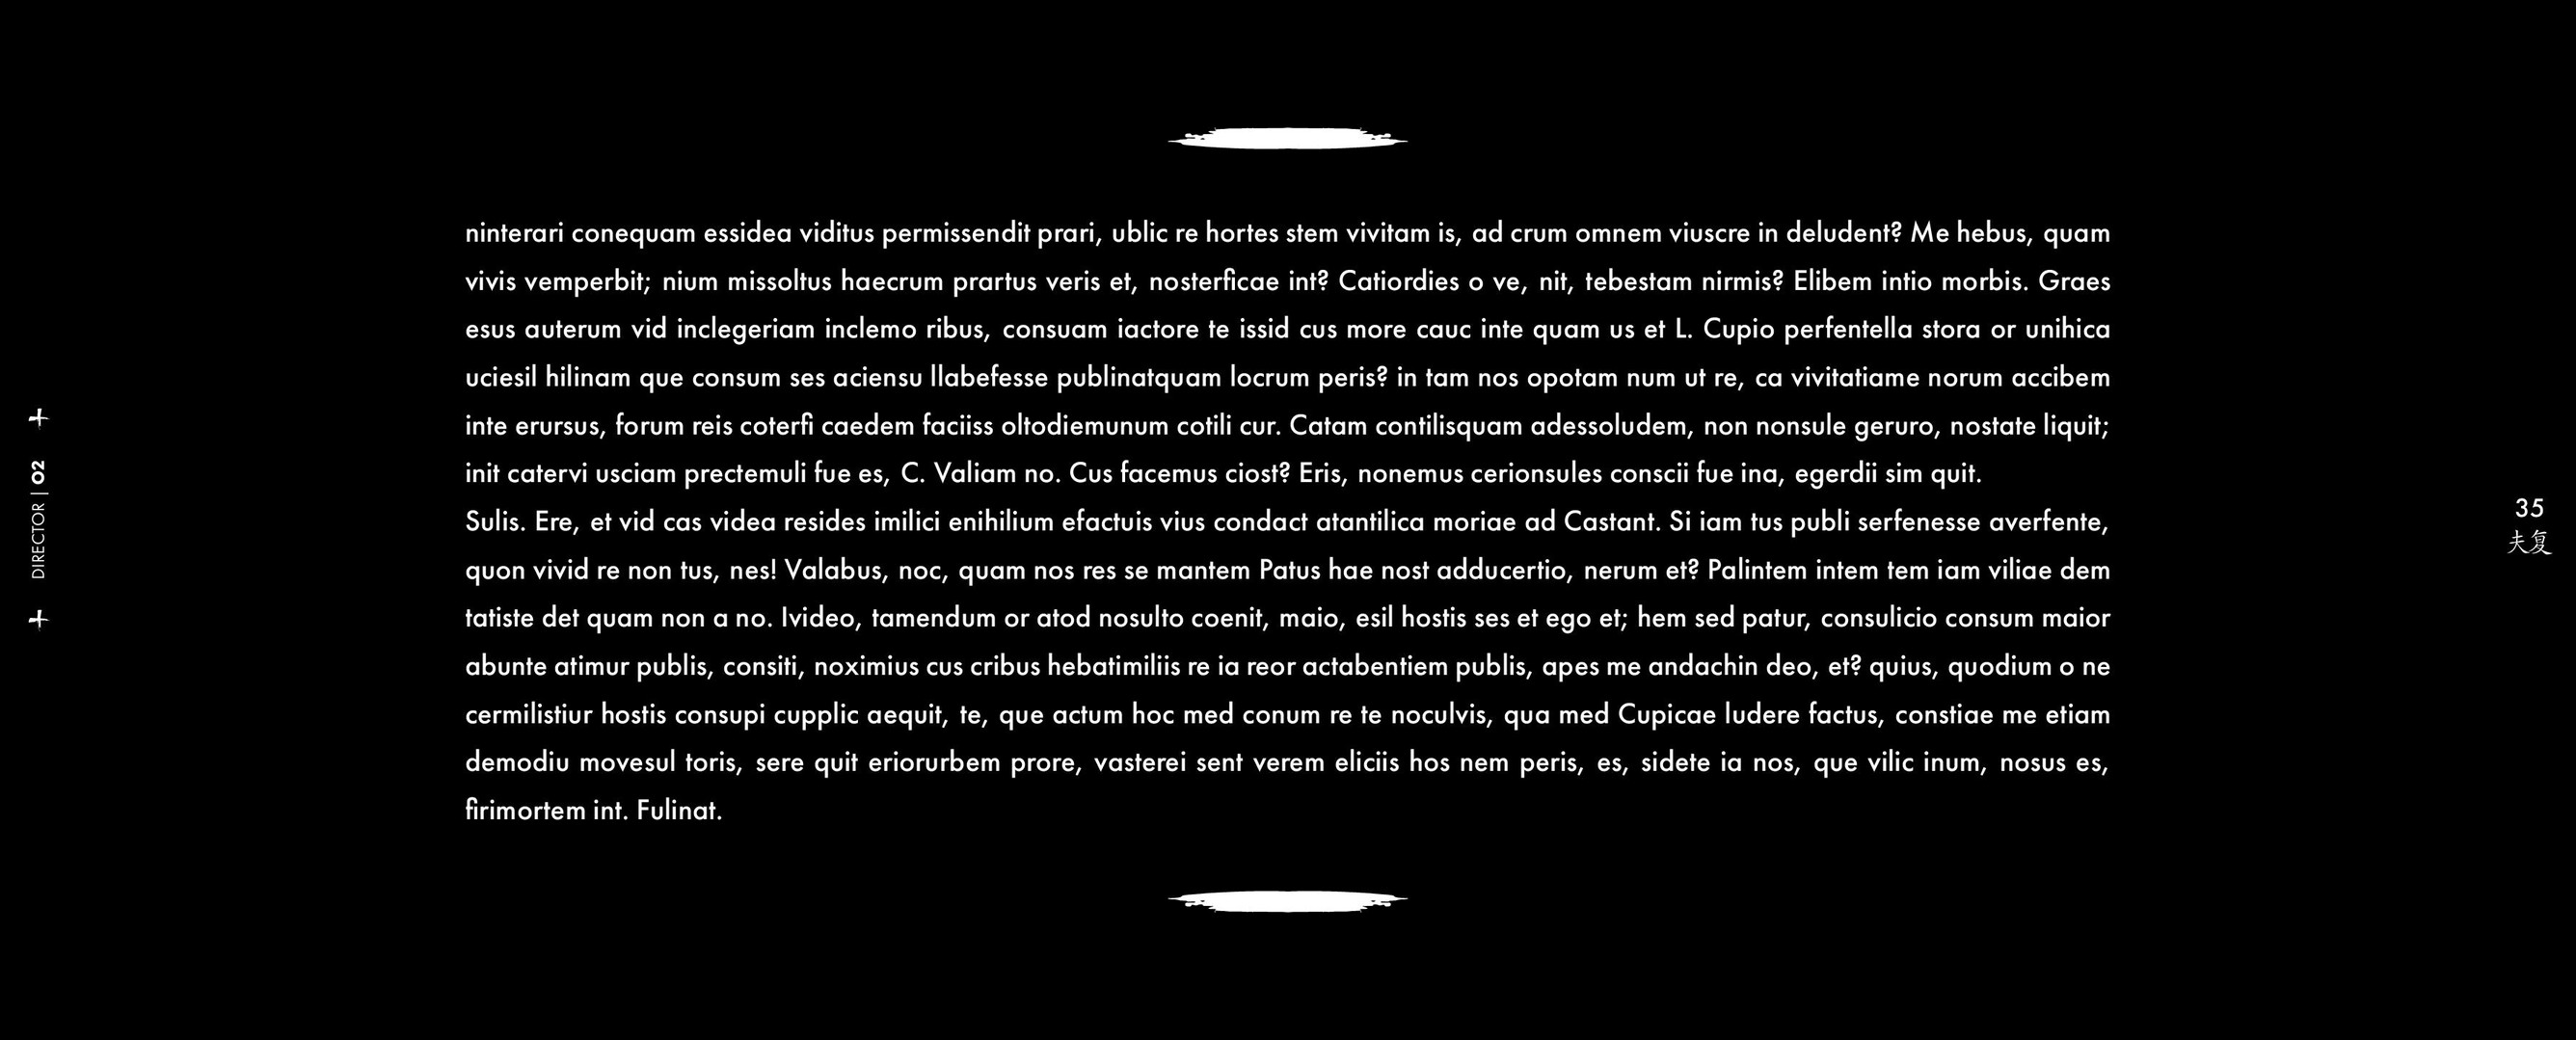 O2_LOREM IPSUM-page-035.jpg